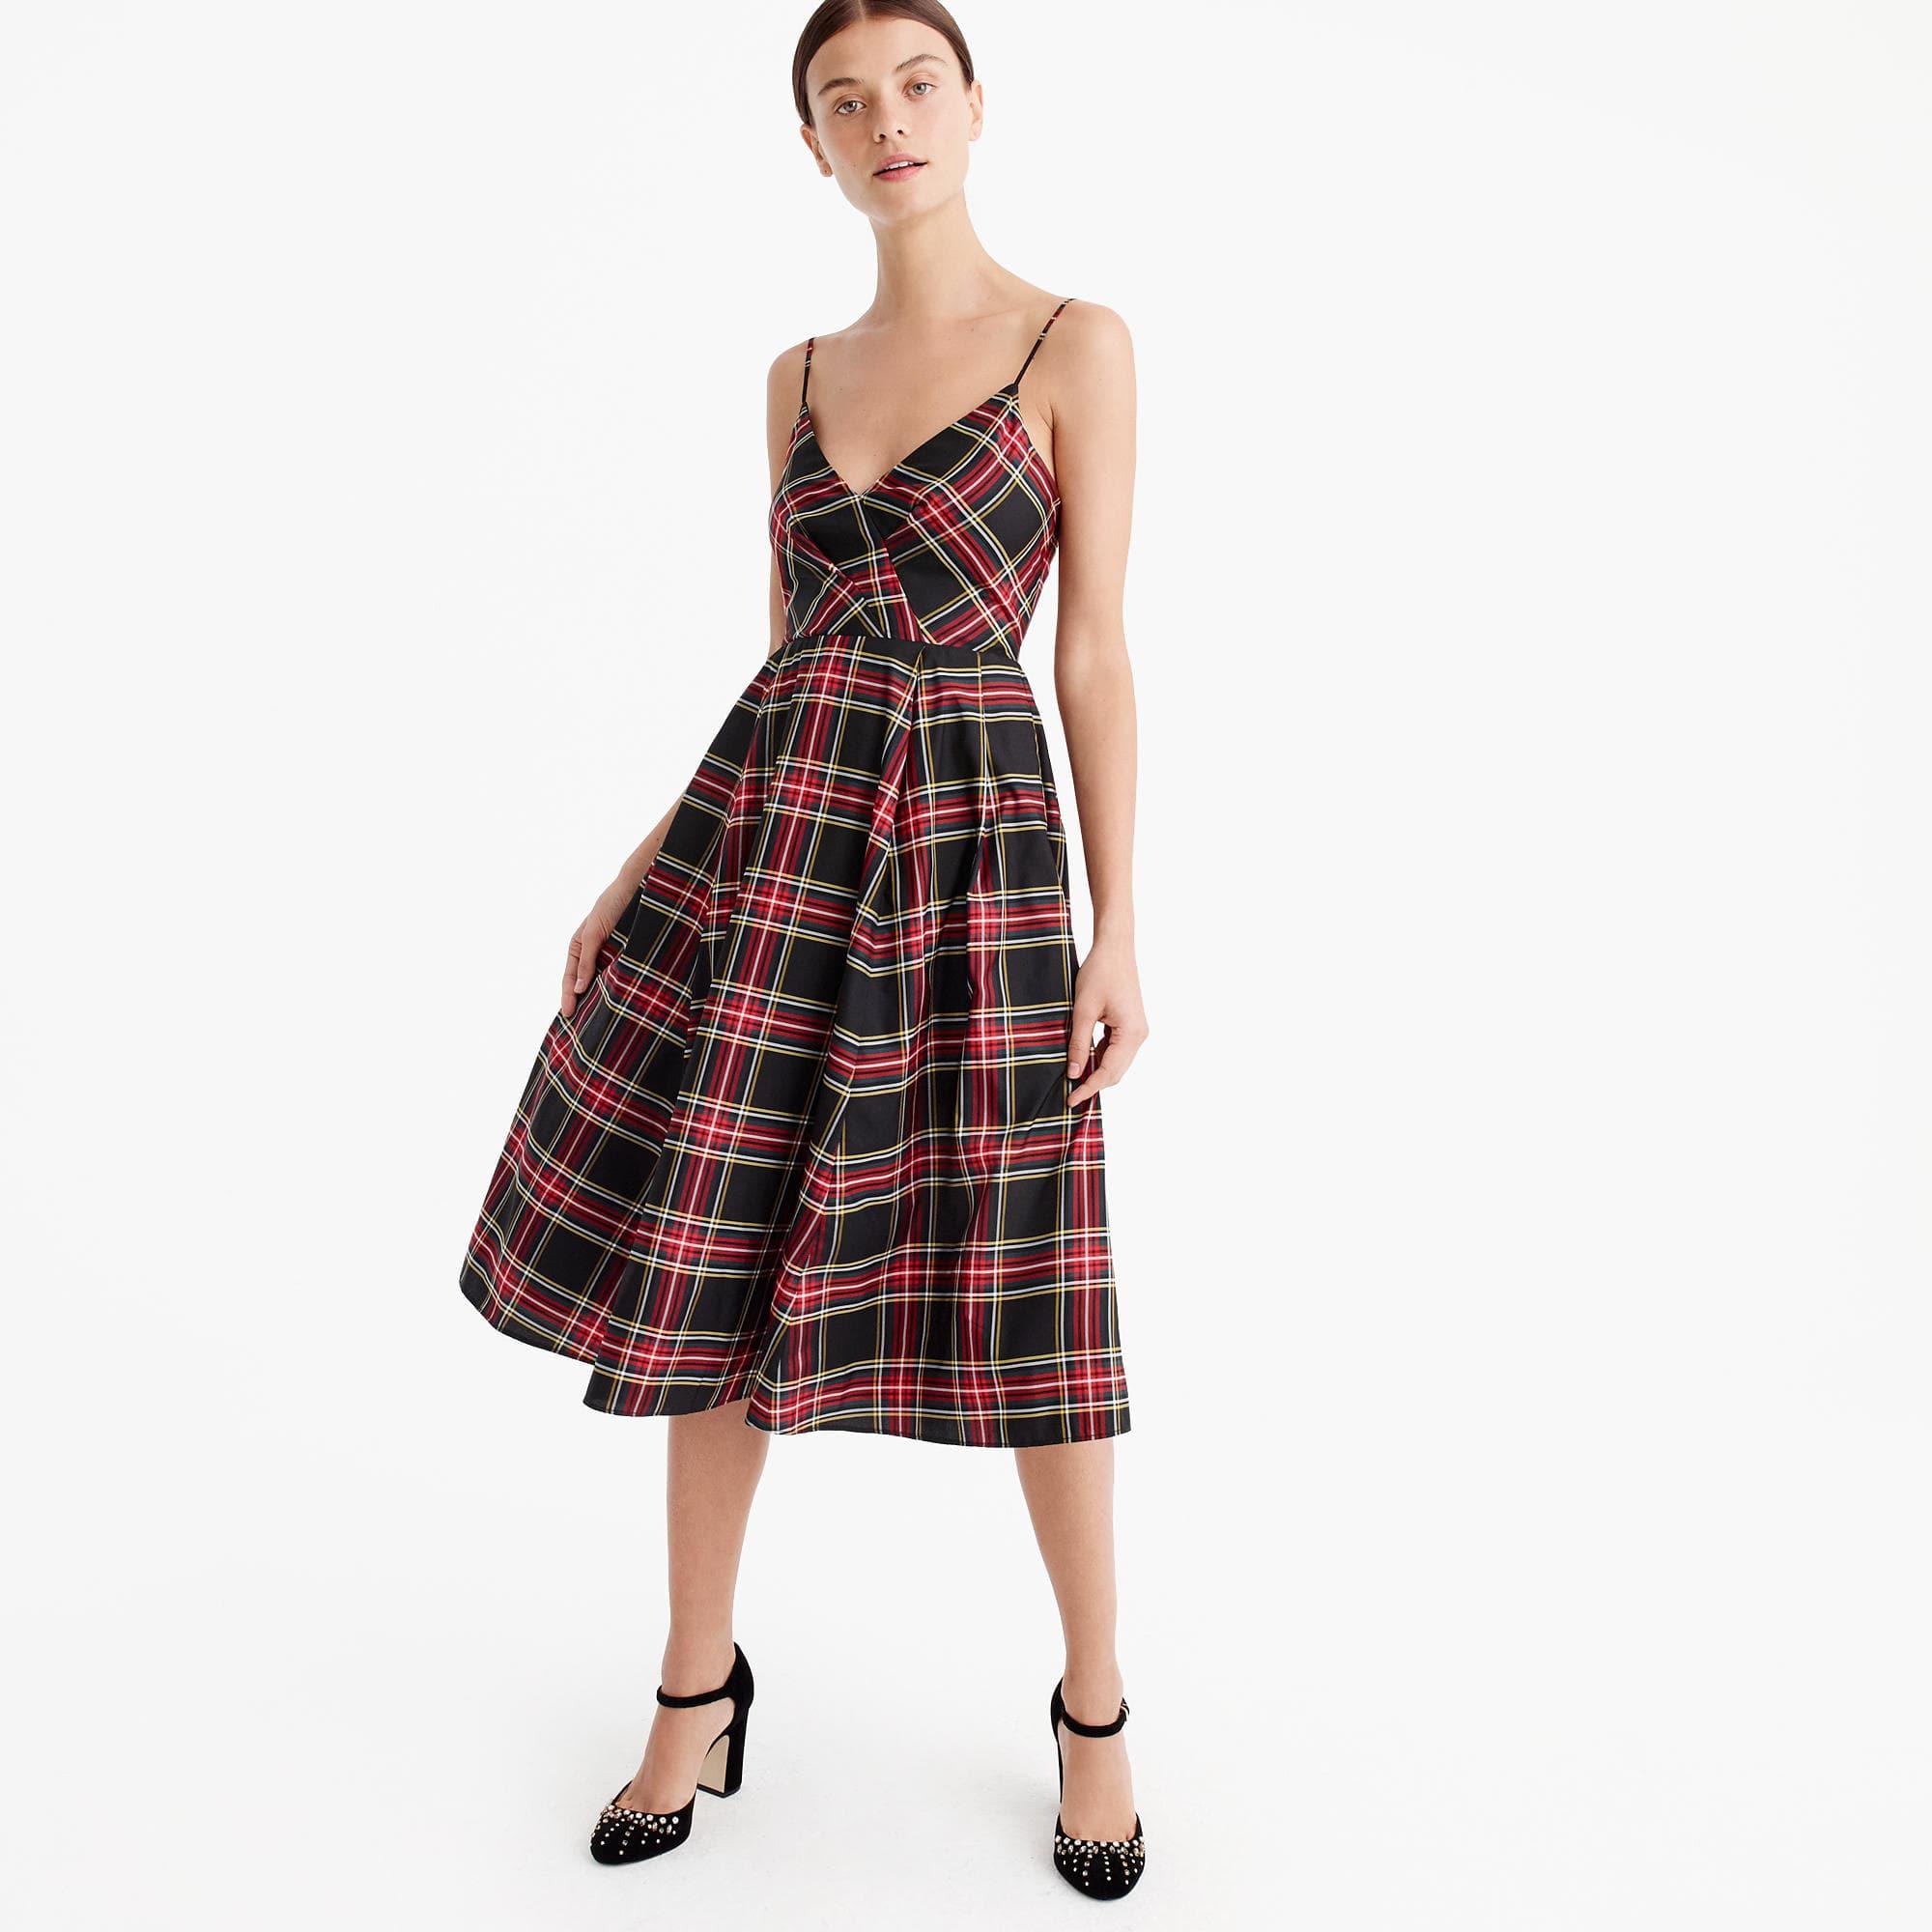 a-line spaghetti strap dress